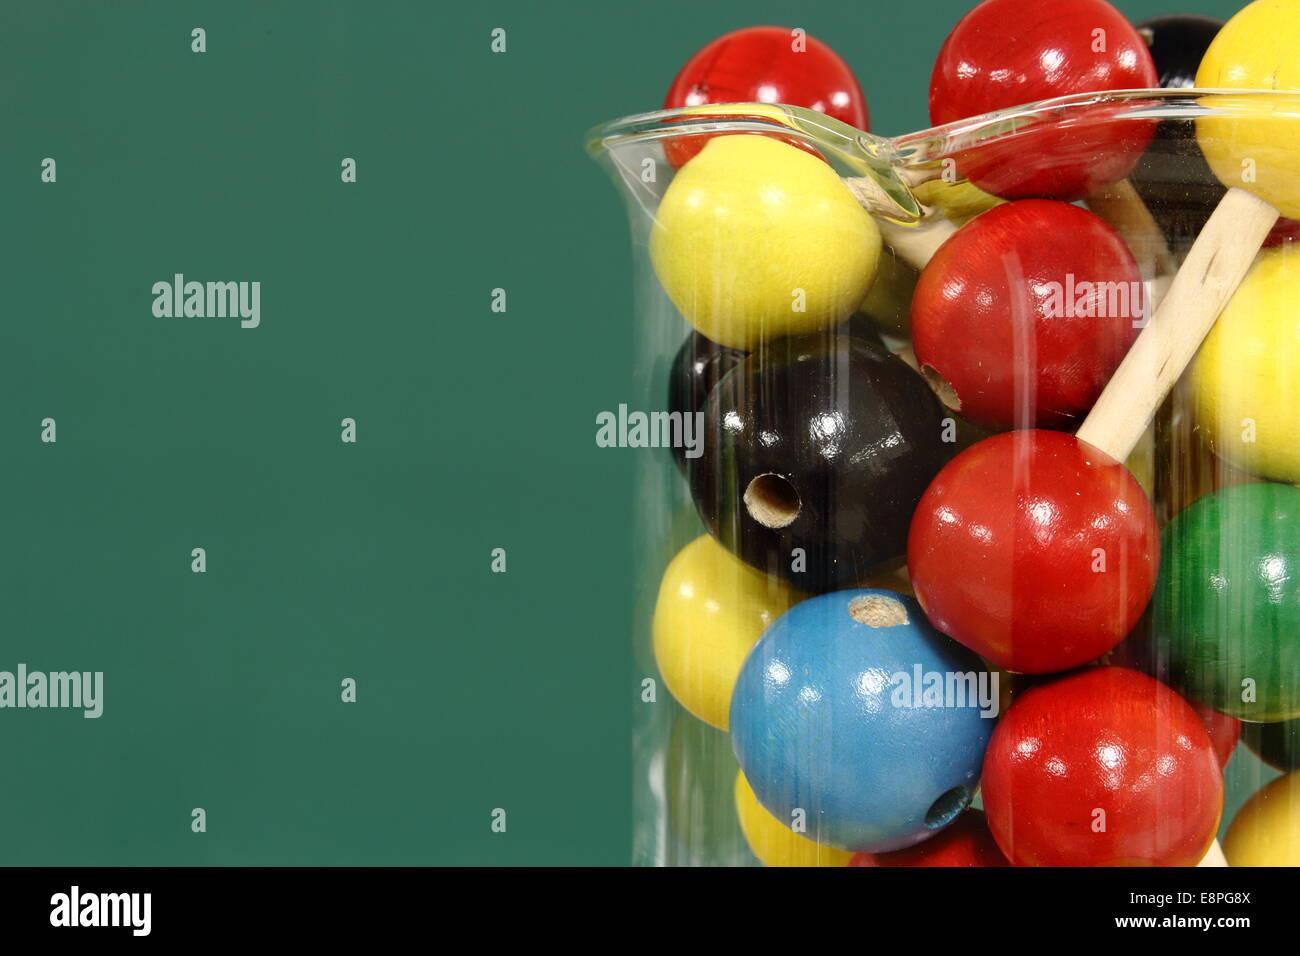 Molecular model: wooden balls in a beaker on a background of green blackboard - Stock Image